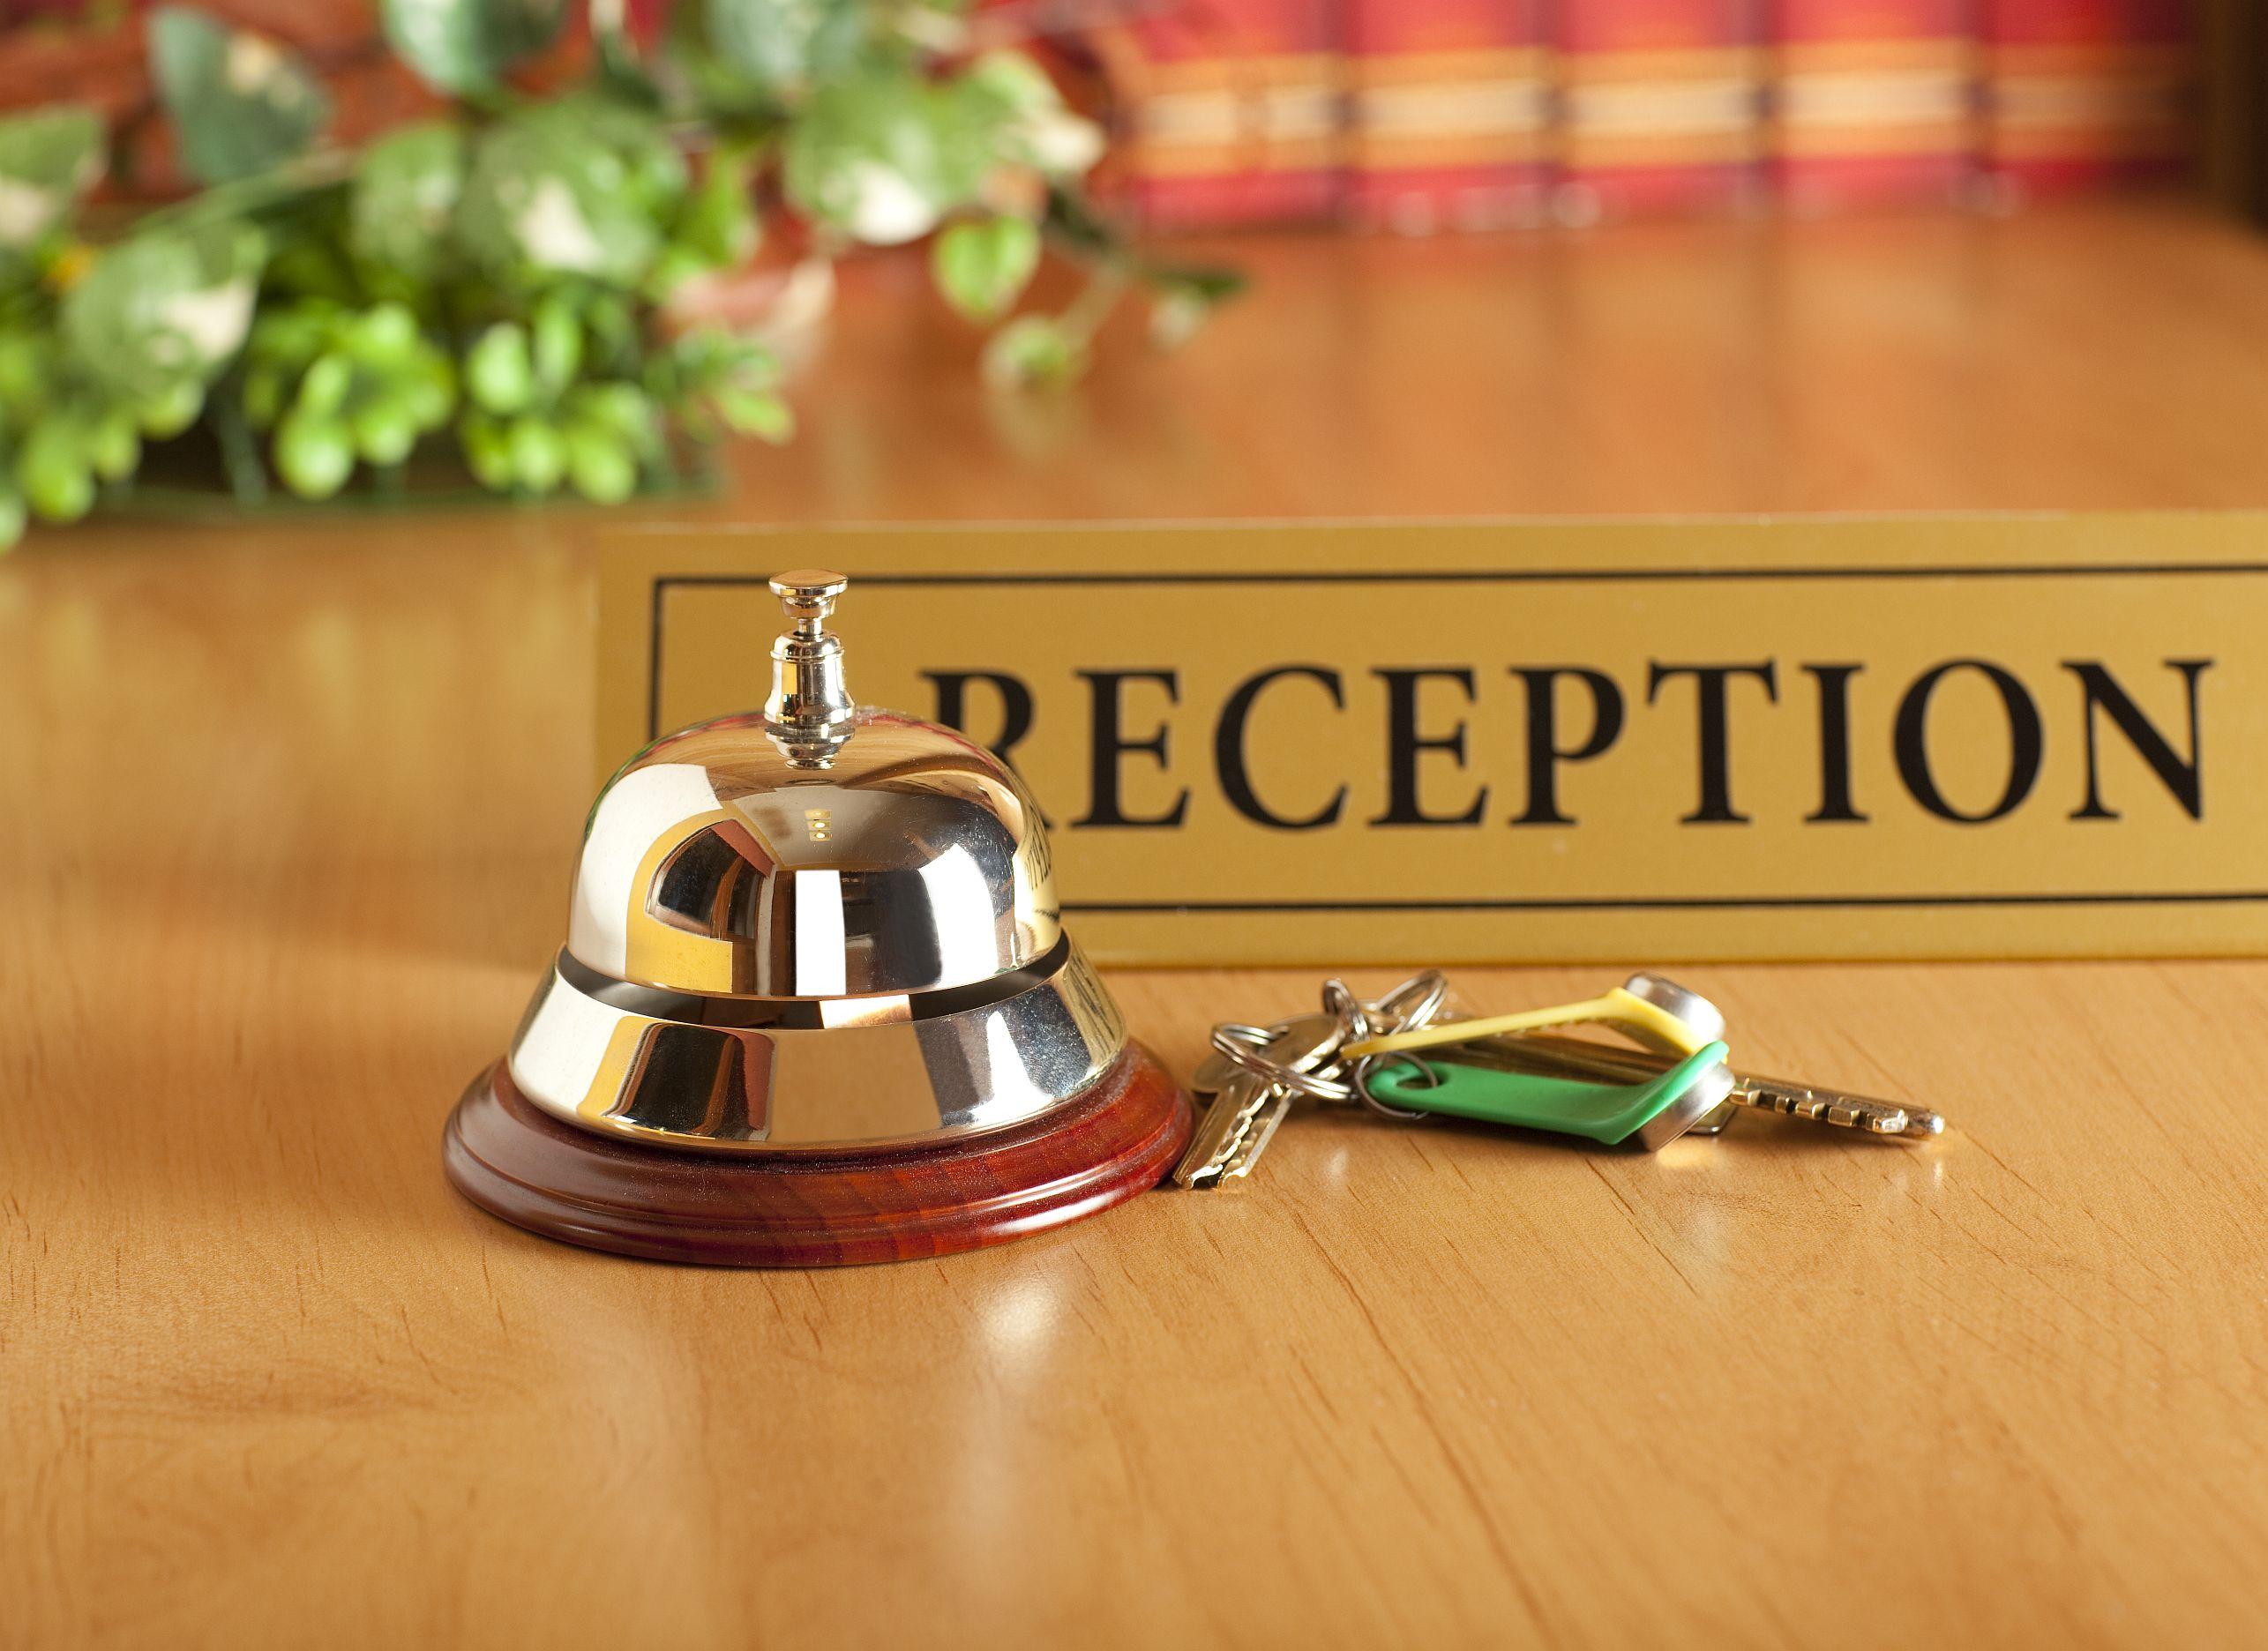 Rezervace{lang}Reservation